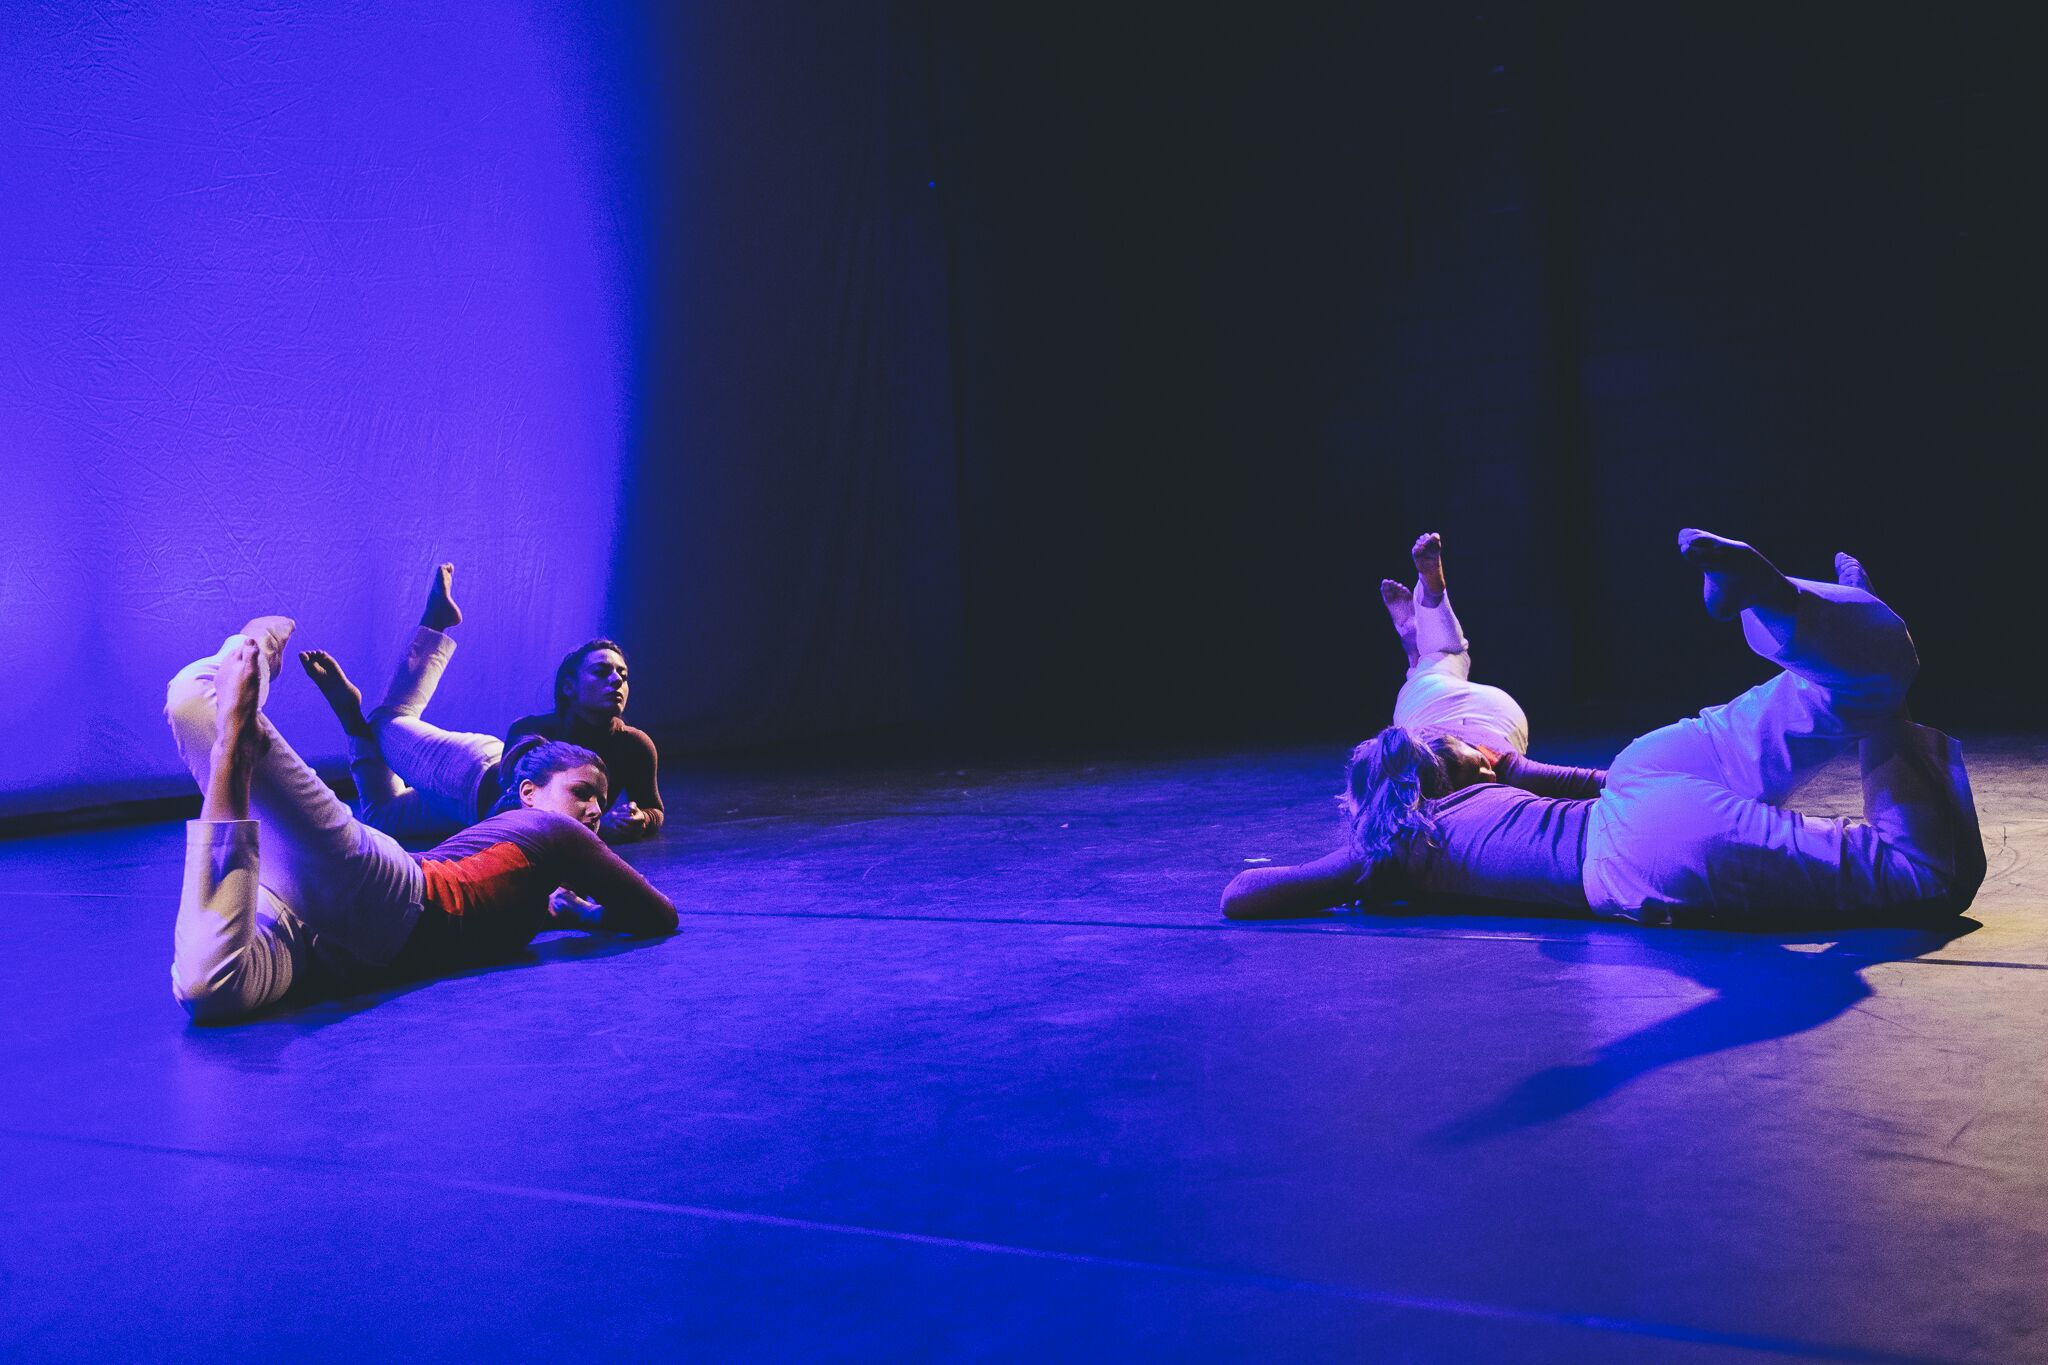 Dancers: Taryn Lavery, Alex Miller, Hailley Laurèn, Lucy Wilson